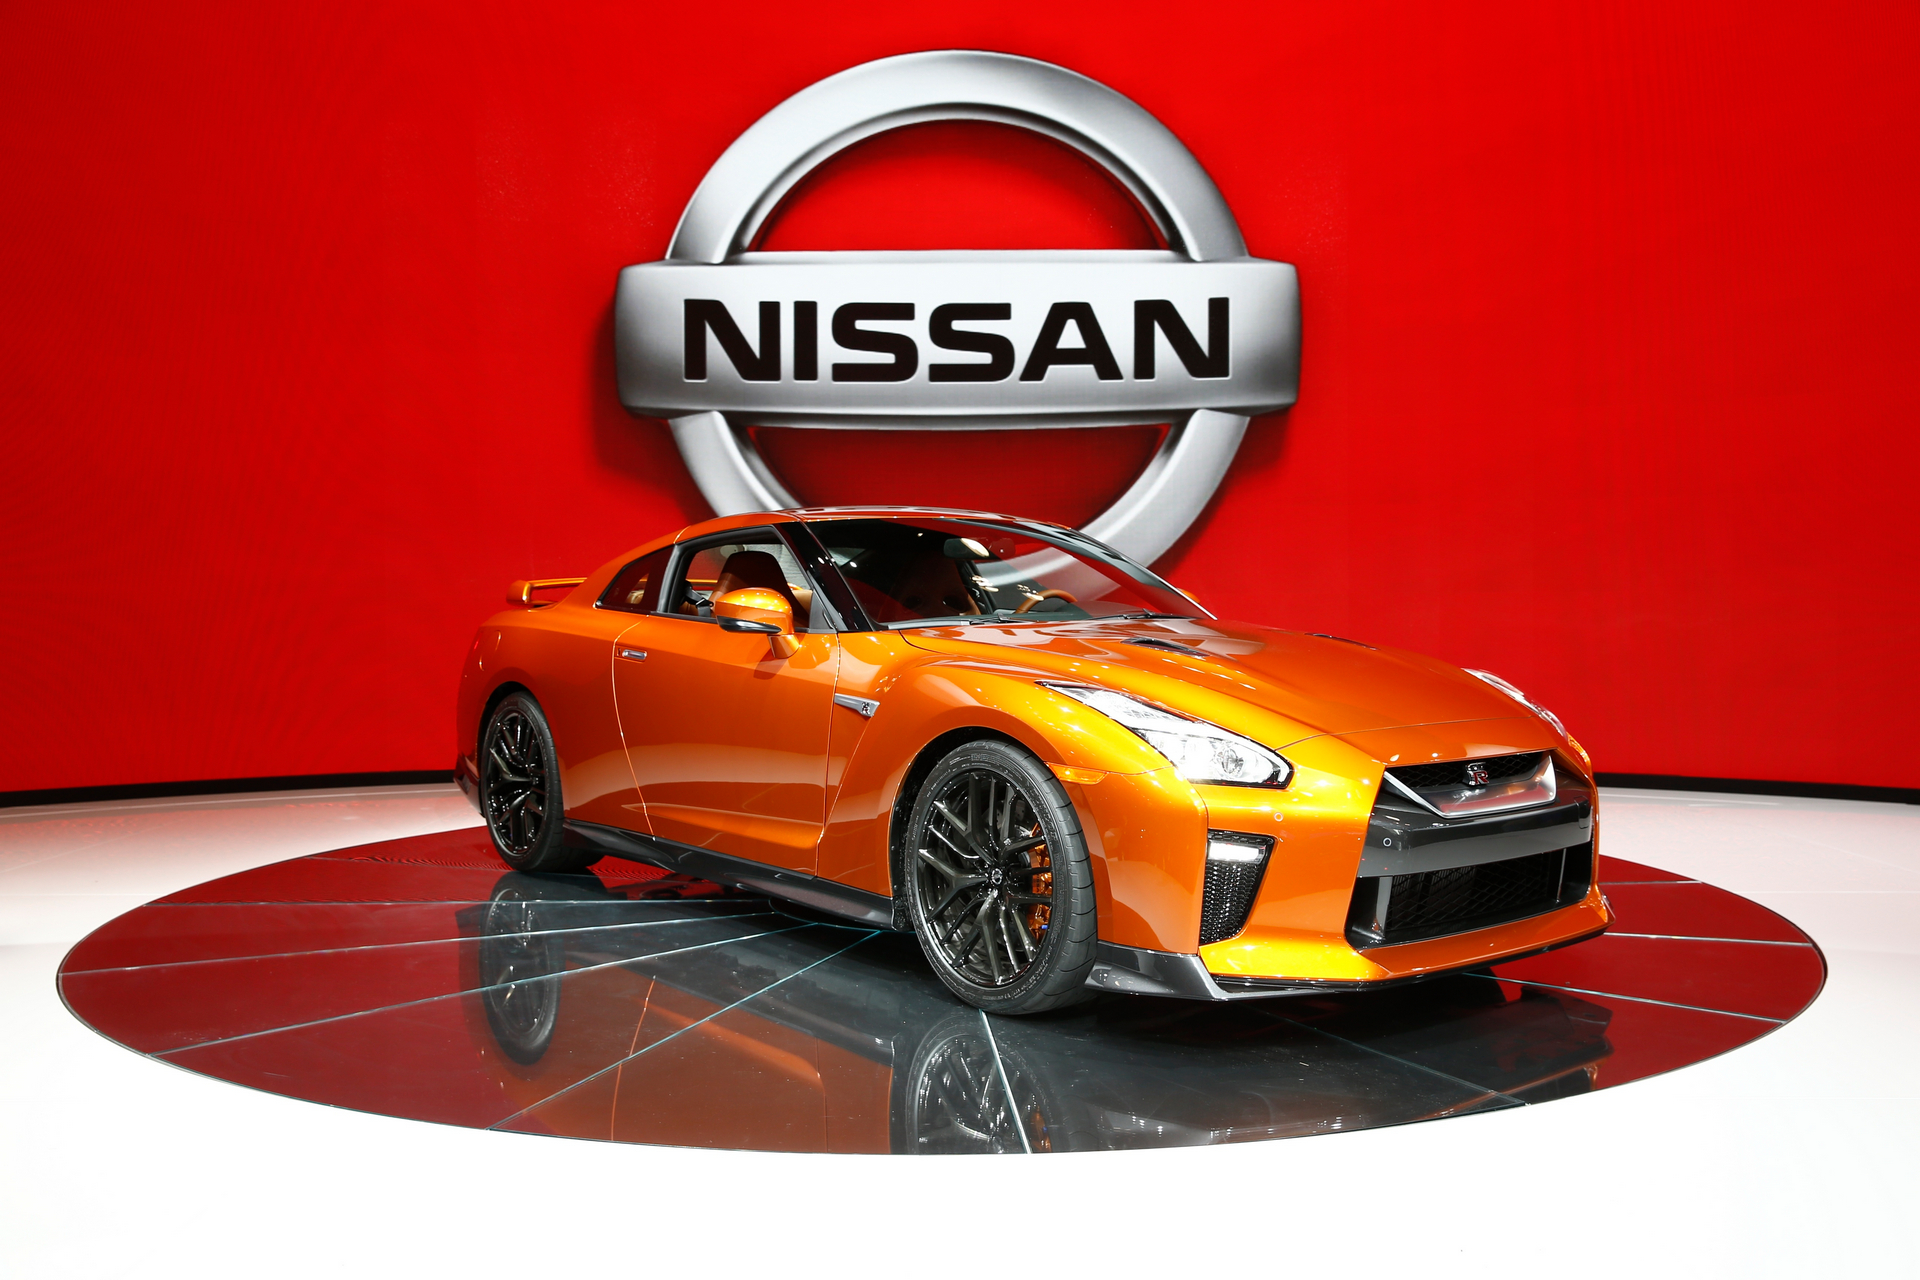 nissan announces u s pricing for 2017 nissan gt r premium carrrs auto portal. Black Bedroom Furniture Sets. Home Design Ideas